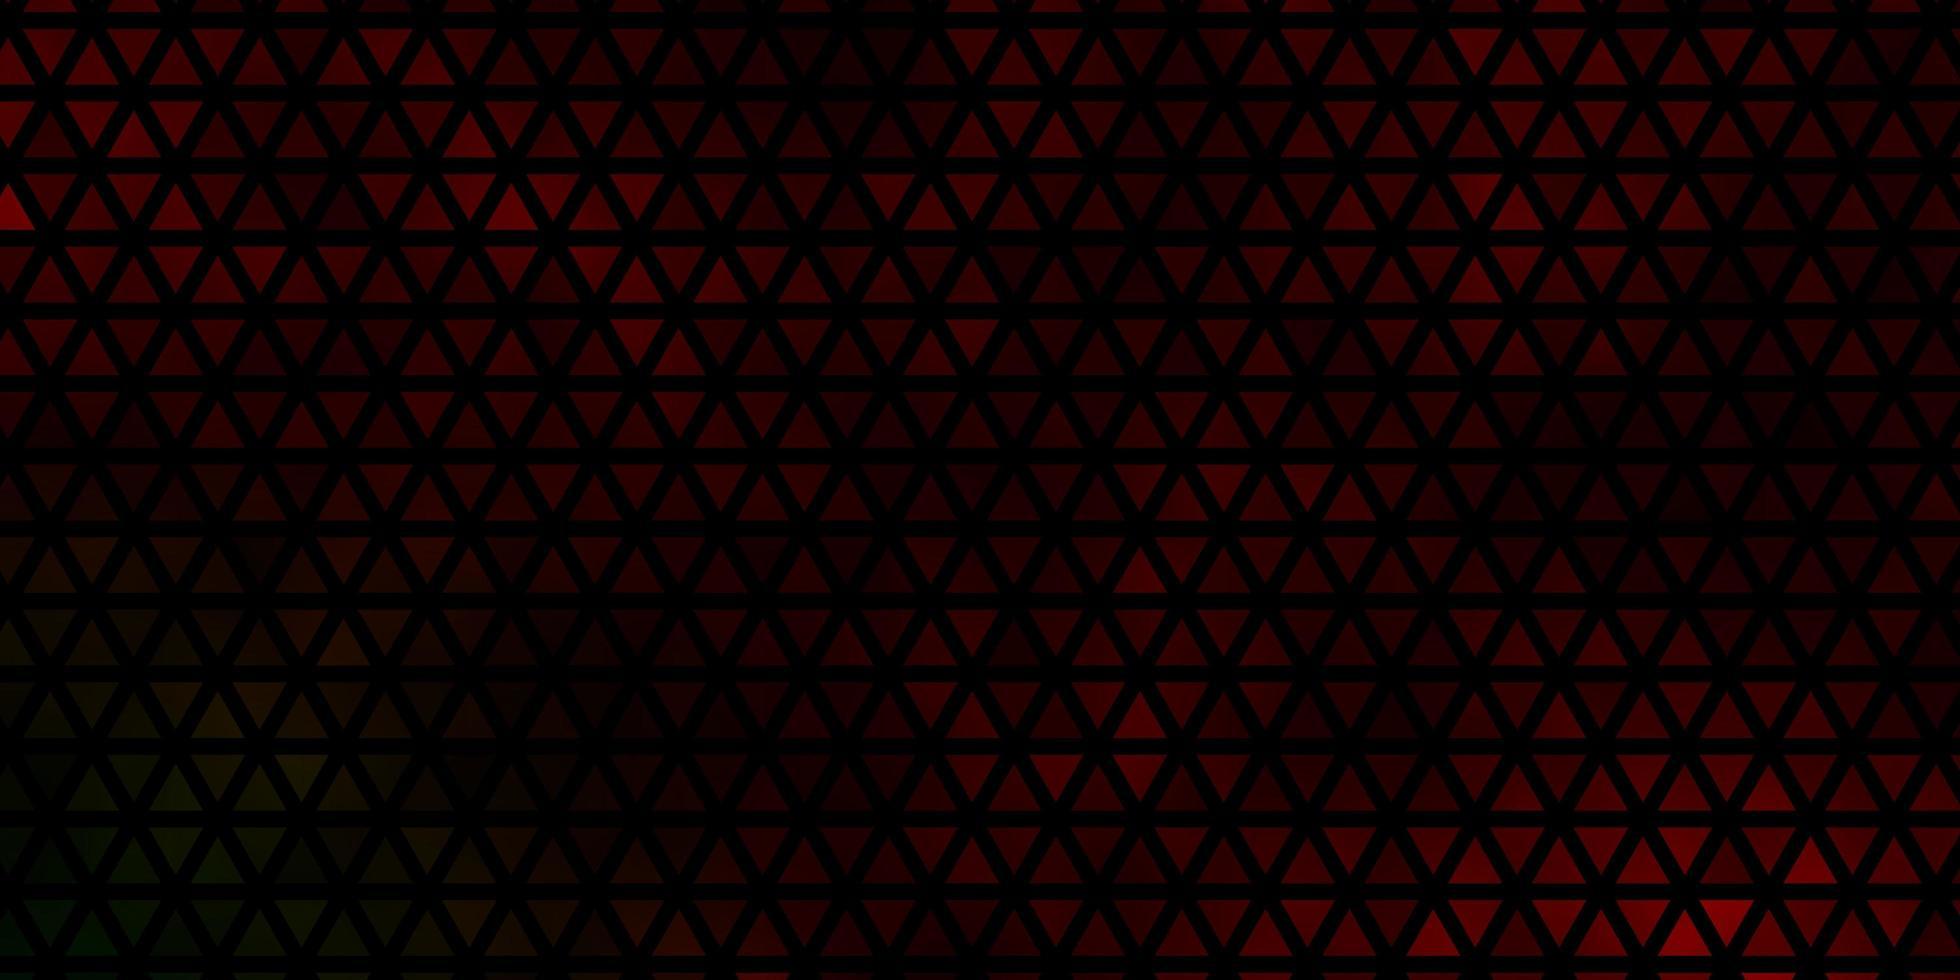 dunkelgrüne, rote Vektorbeschaffenheit mit dreieckigem Stil. vektor